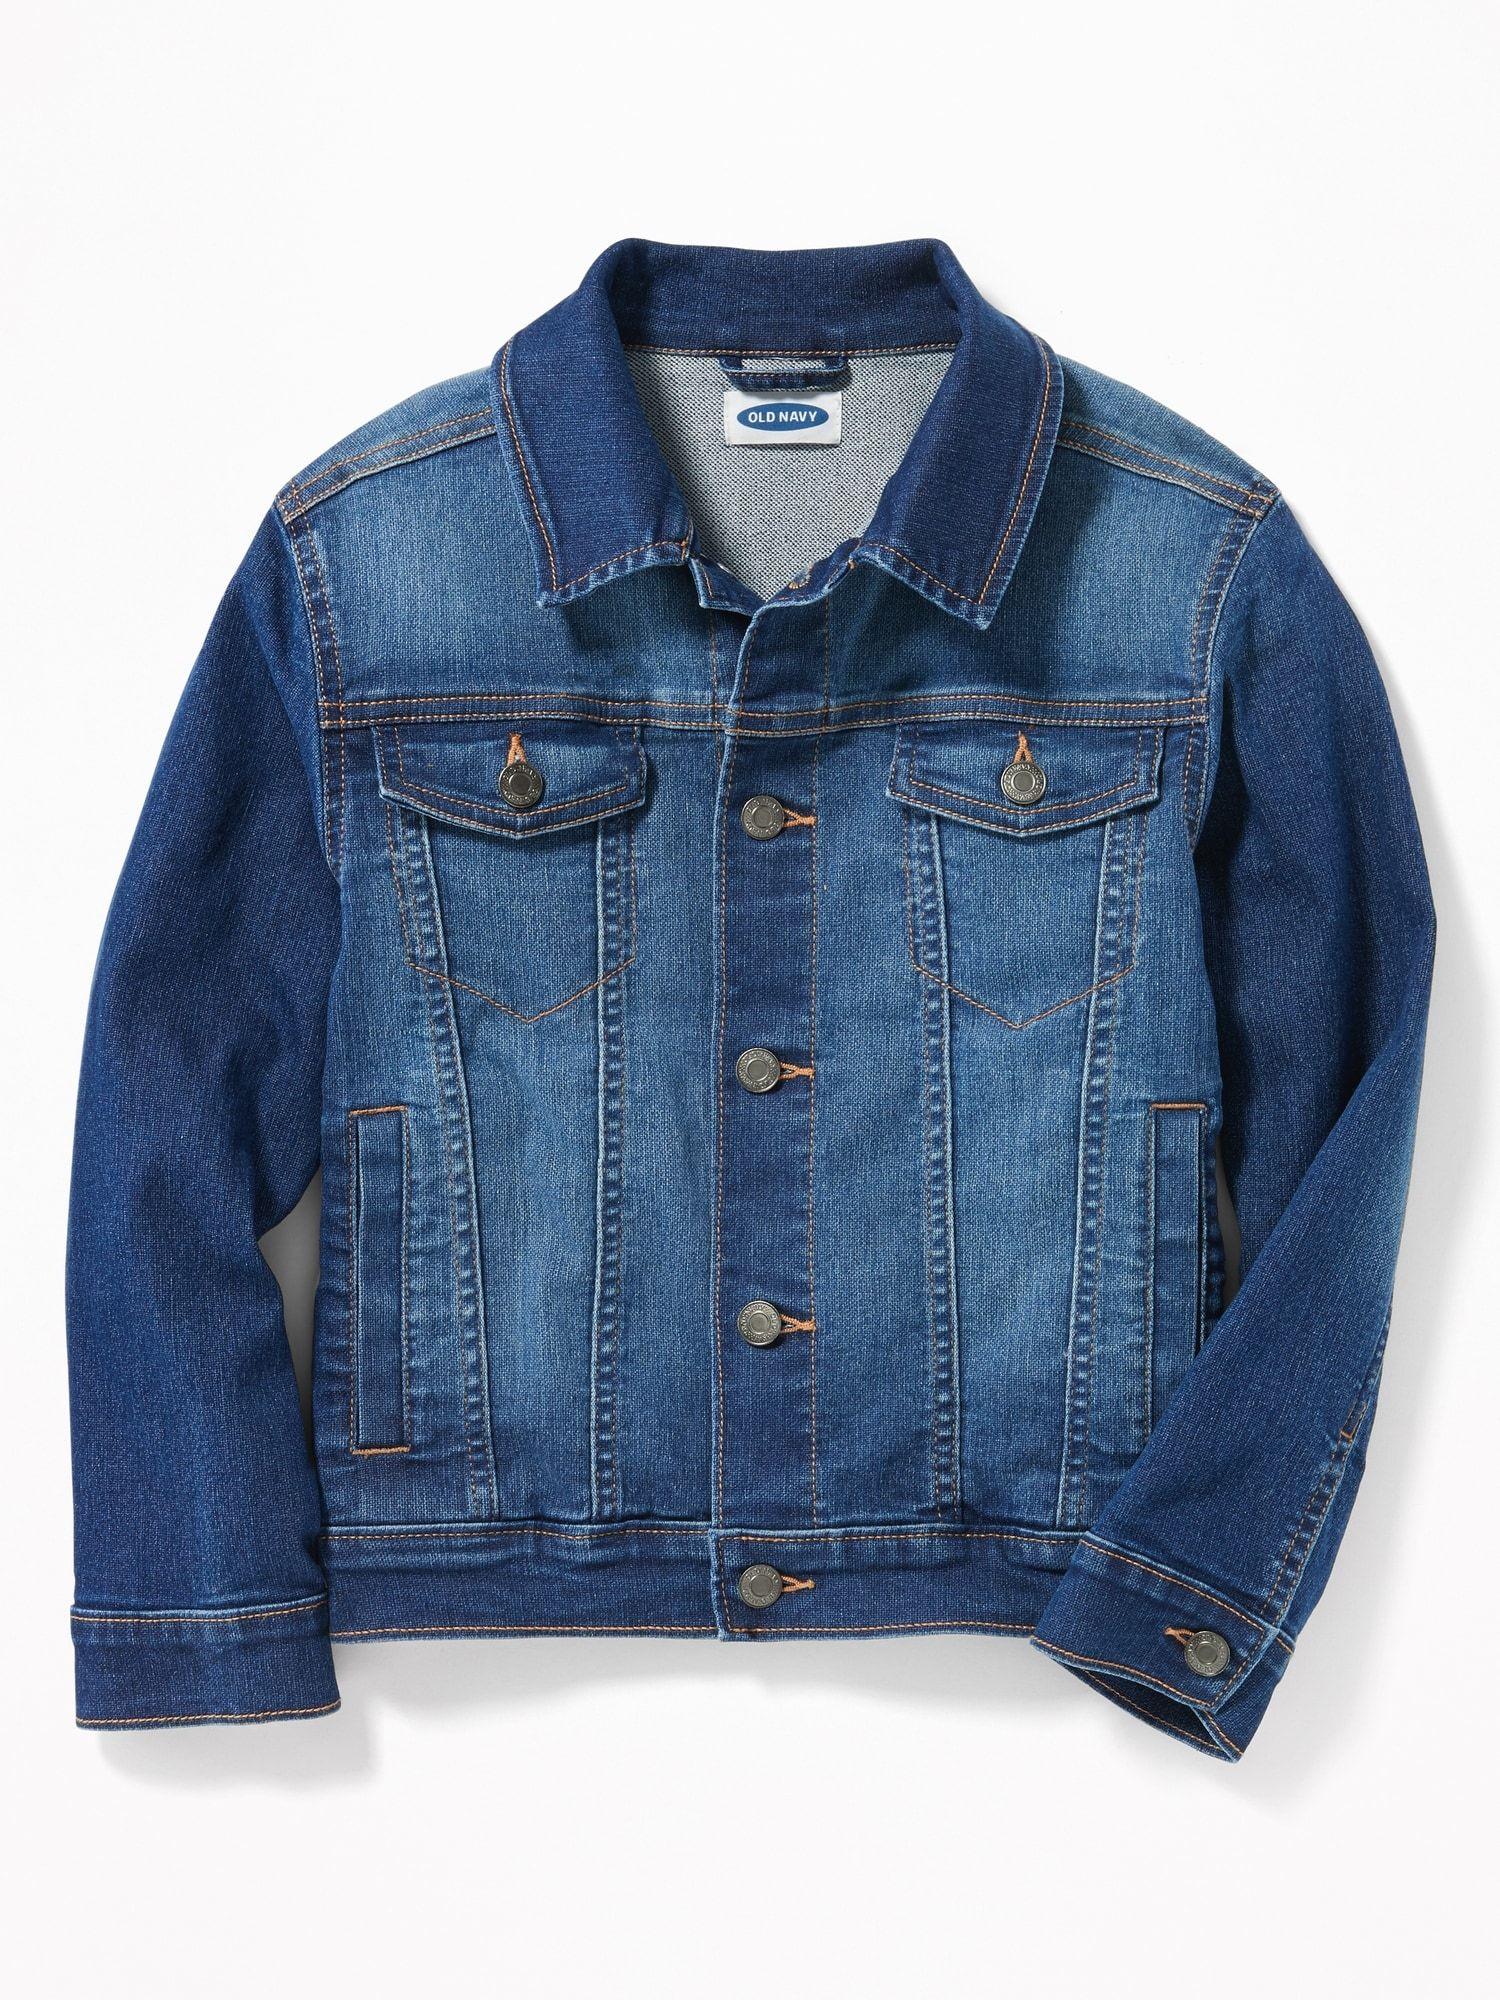 Old Navy Boys Jean Jacket Medium Wash Regular Size S In 2021 Kids Jeans Jacket Boys Jean Jacket Boy Outerwear [ 2000 x 1500 Pixel ]